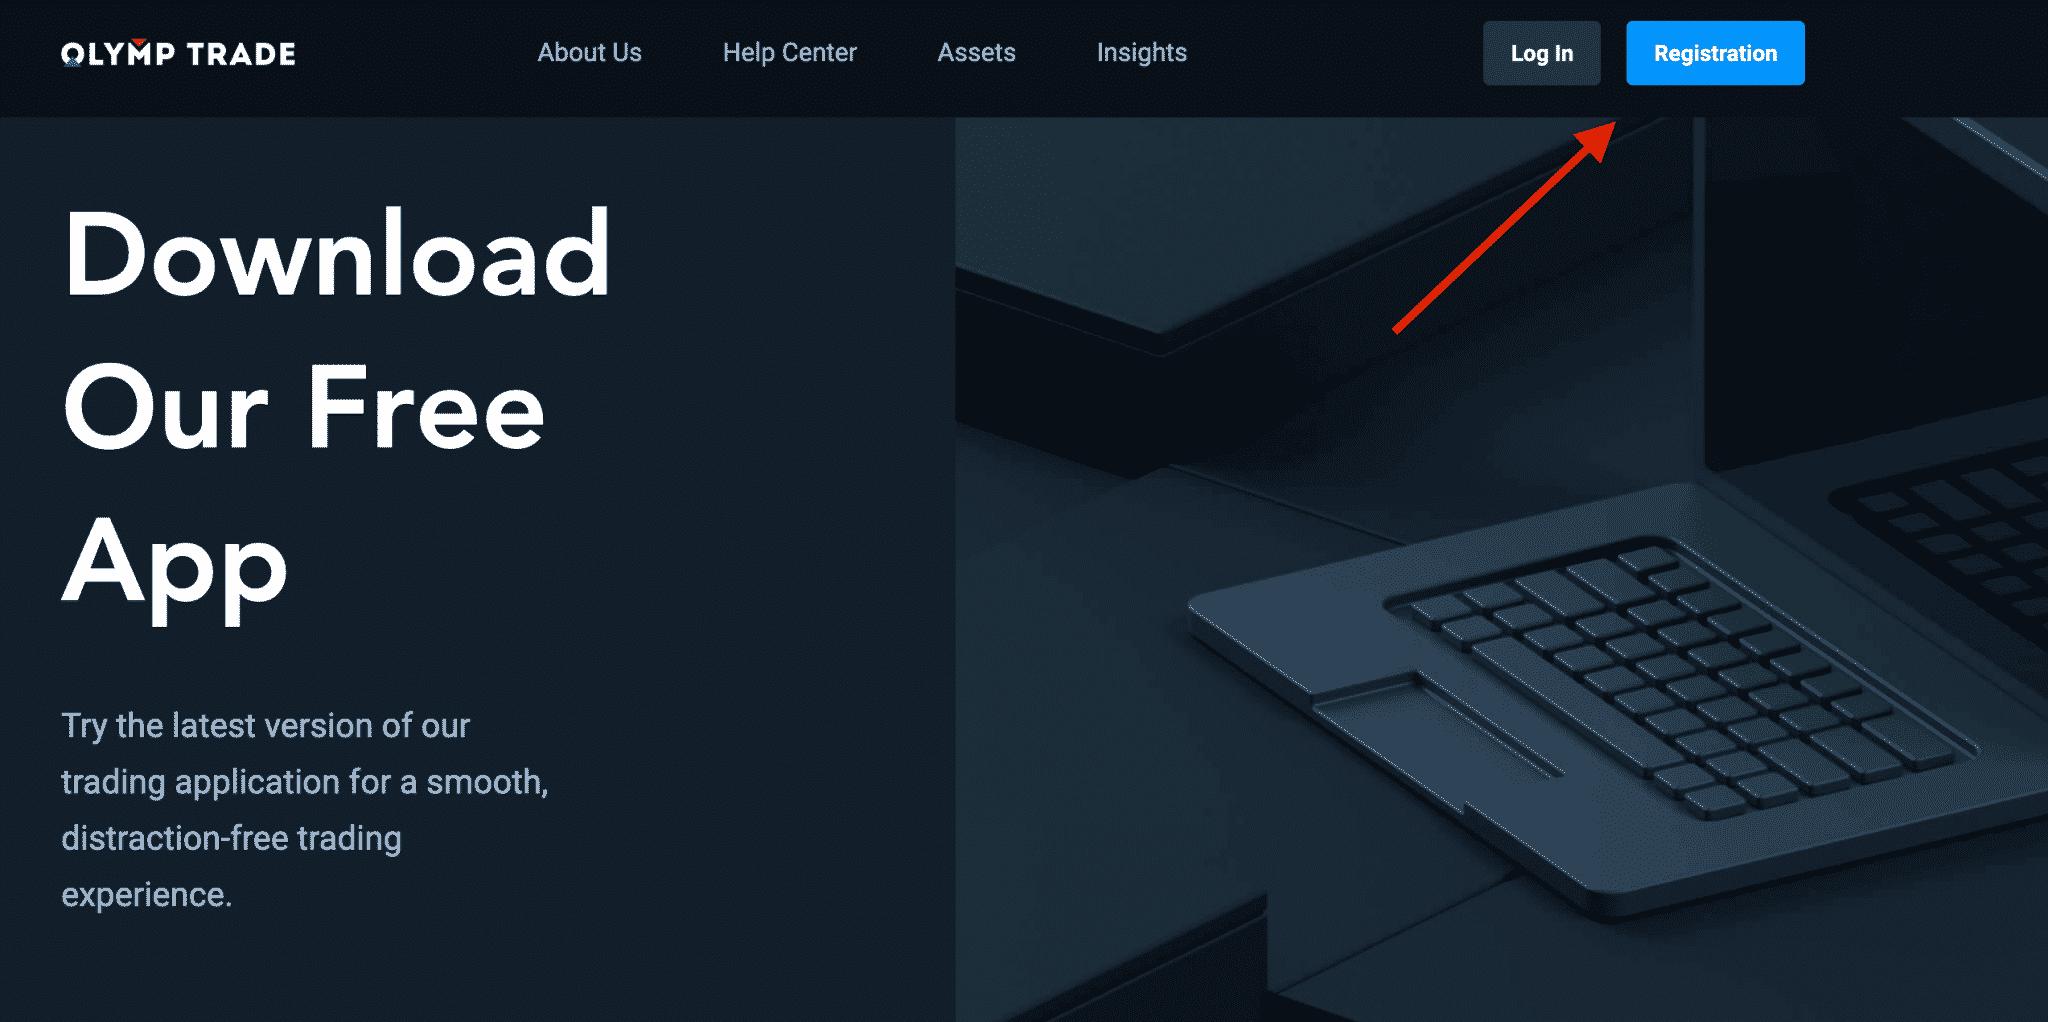 registration before download OlympTrade PC app